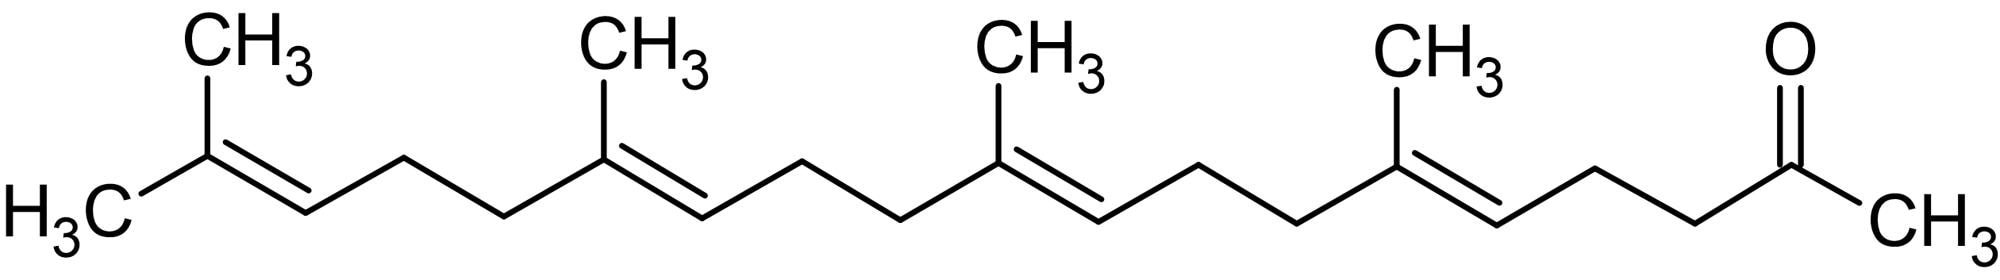 Chemical Structure - Teprenone (Geranylgeranylacetone), HSP70, HSPB8, and HSPB1 expression inducer (ab146190)